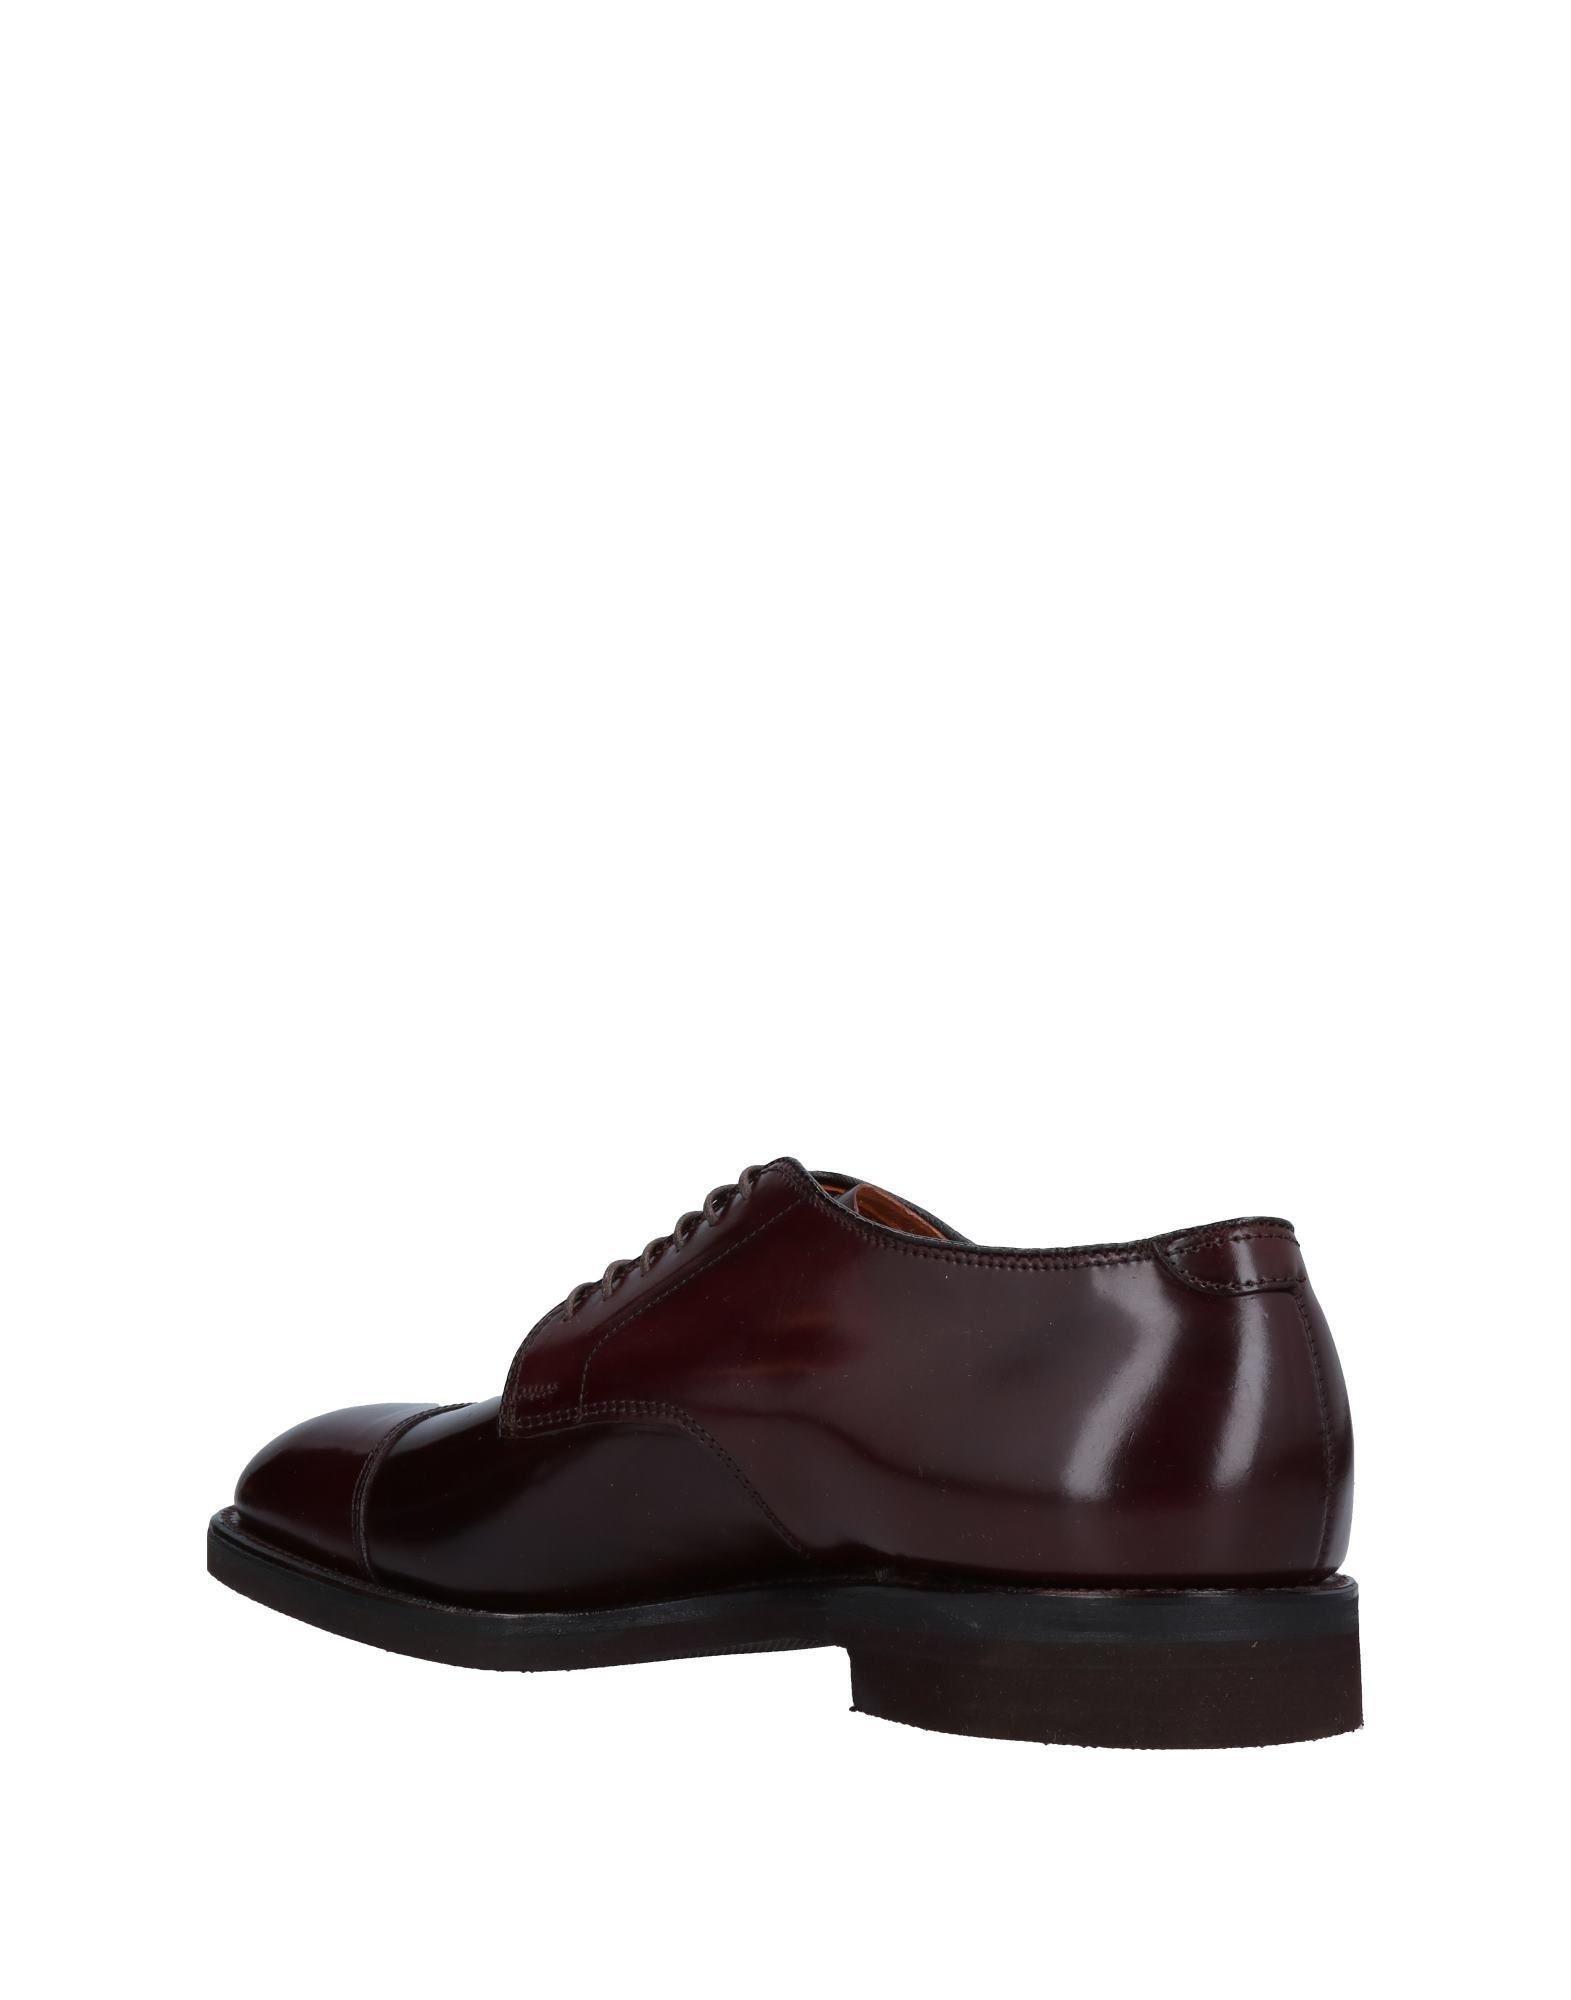 Alden Leather Lace-up Shoe for Men